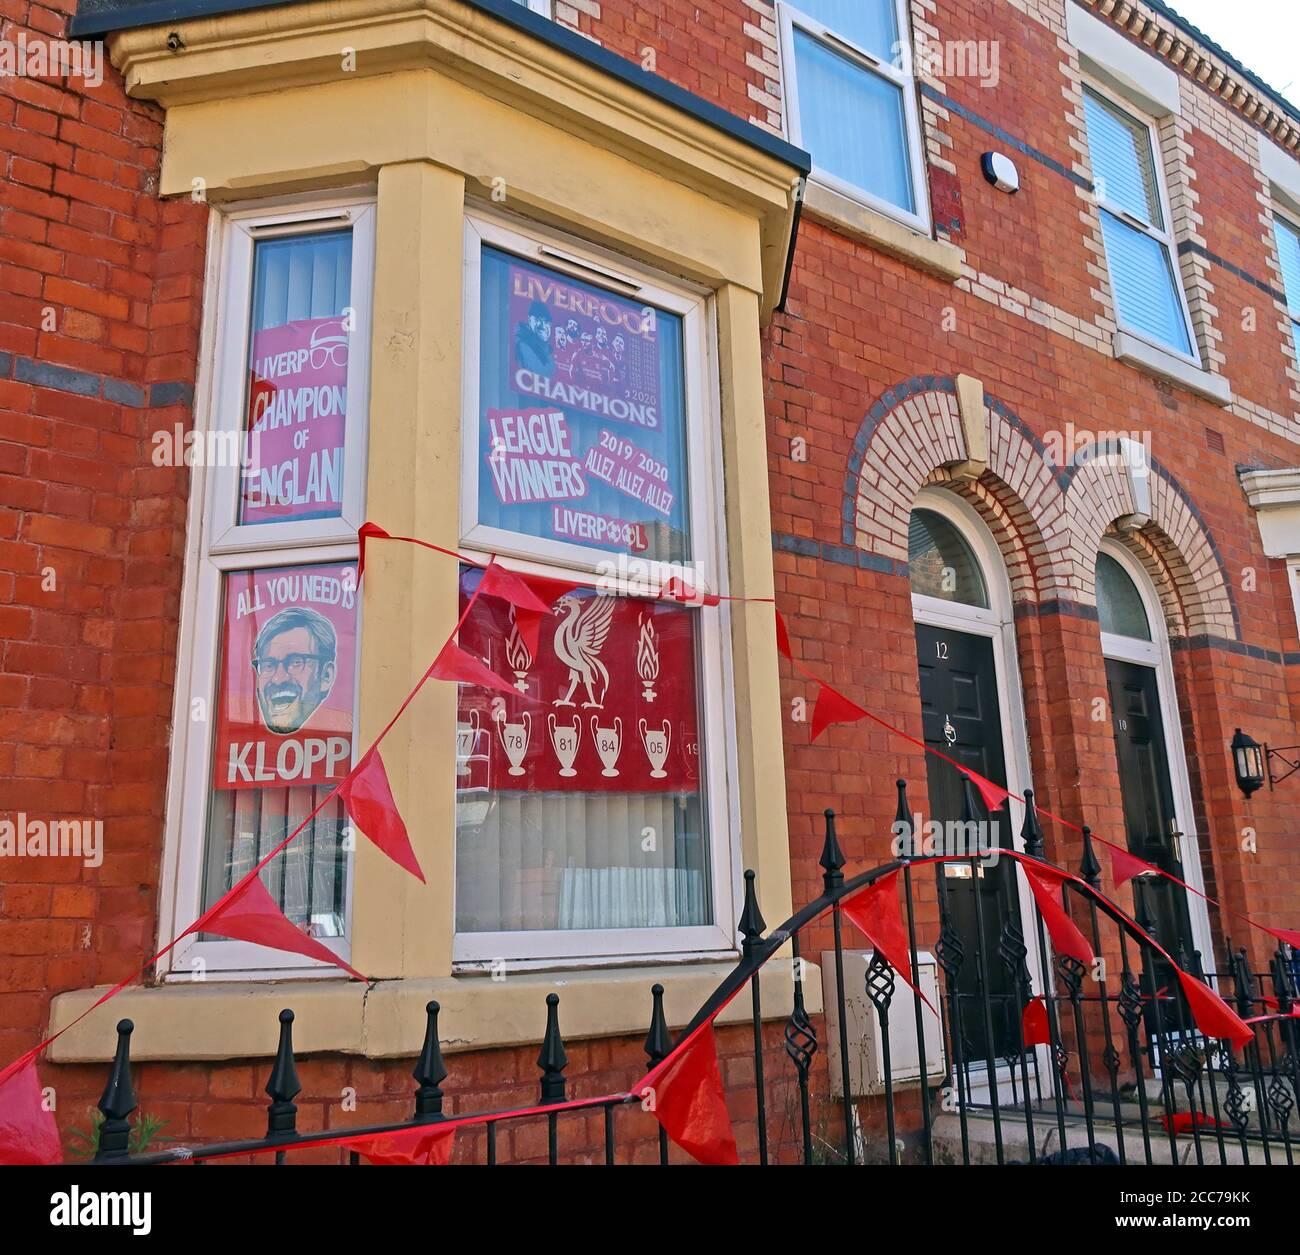 Dieses Stockfoto: Alles, was Sie brauchen, ist Klopp, Liverpool Champions, League Winners, Terraced House, Liverpool Fans, Anfield, L4, Merseyside, England, Großbritannien - 2CC79K